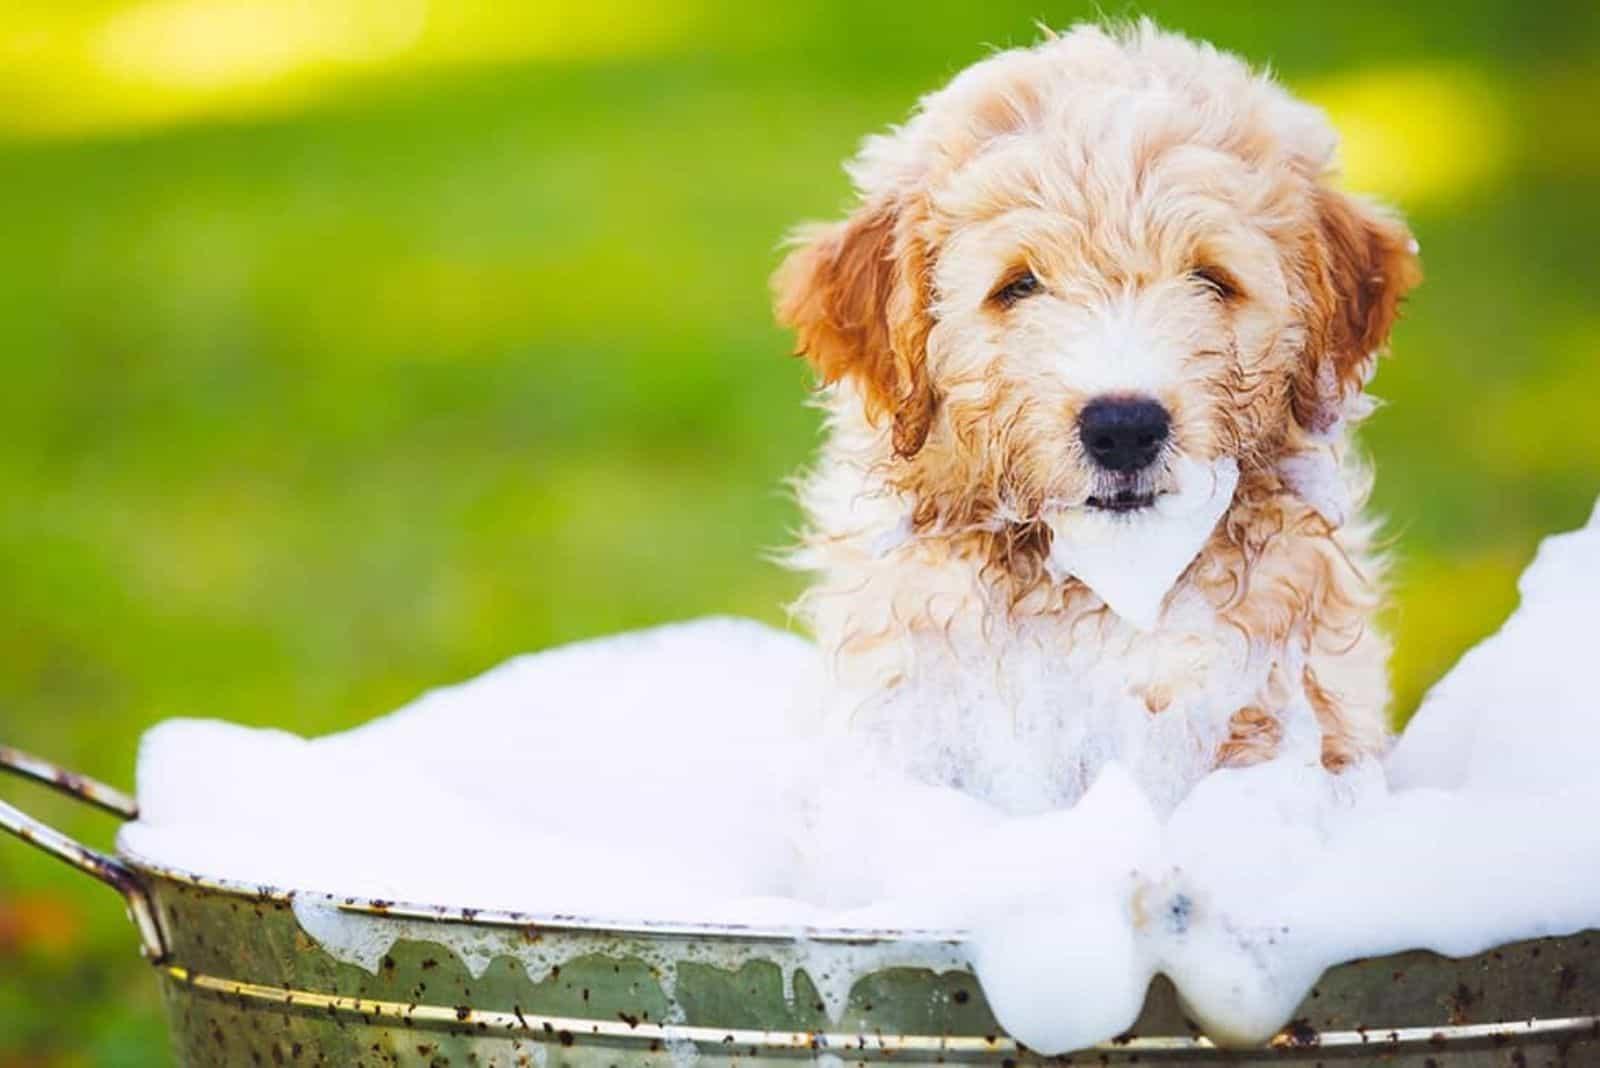 Goldendoodles in a bucket full of foam